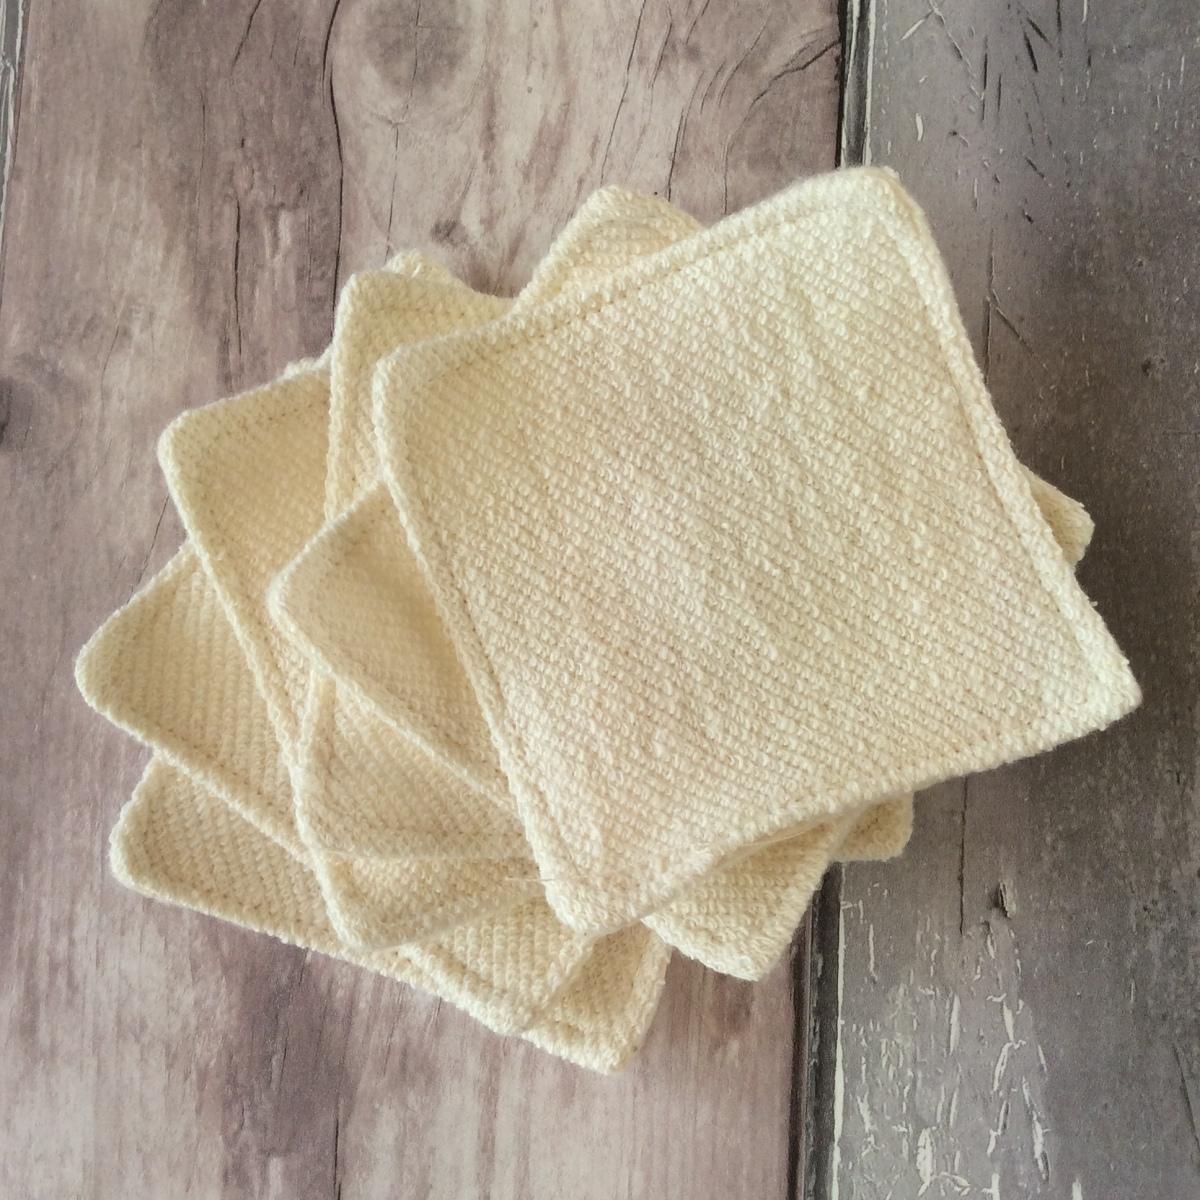 Organic Hemp and Cotton Makeup Remover Pads, Handmade Haven